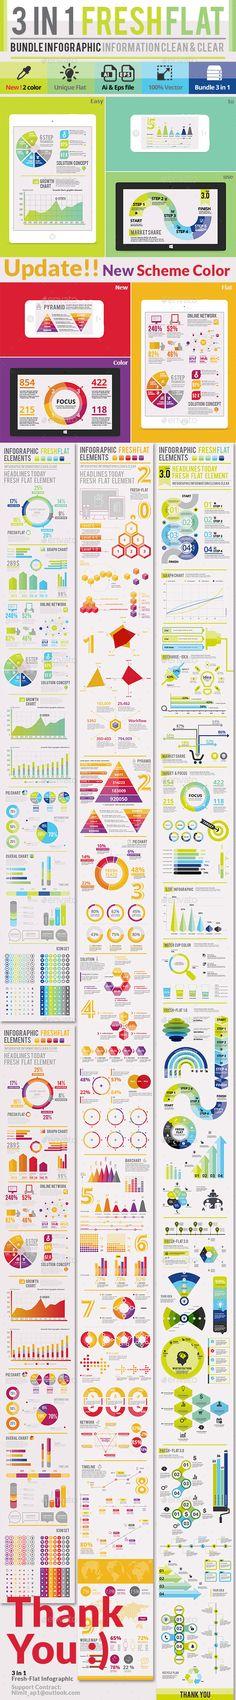 3 in 1 Fresh-Flat Infographic EPS, AI Template #design Download: http://graphicriver.net/item/3-in-1-freshflat/9016582?ref=ksioks